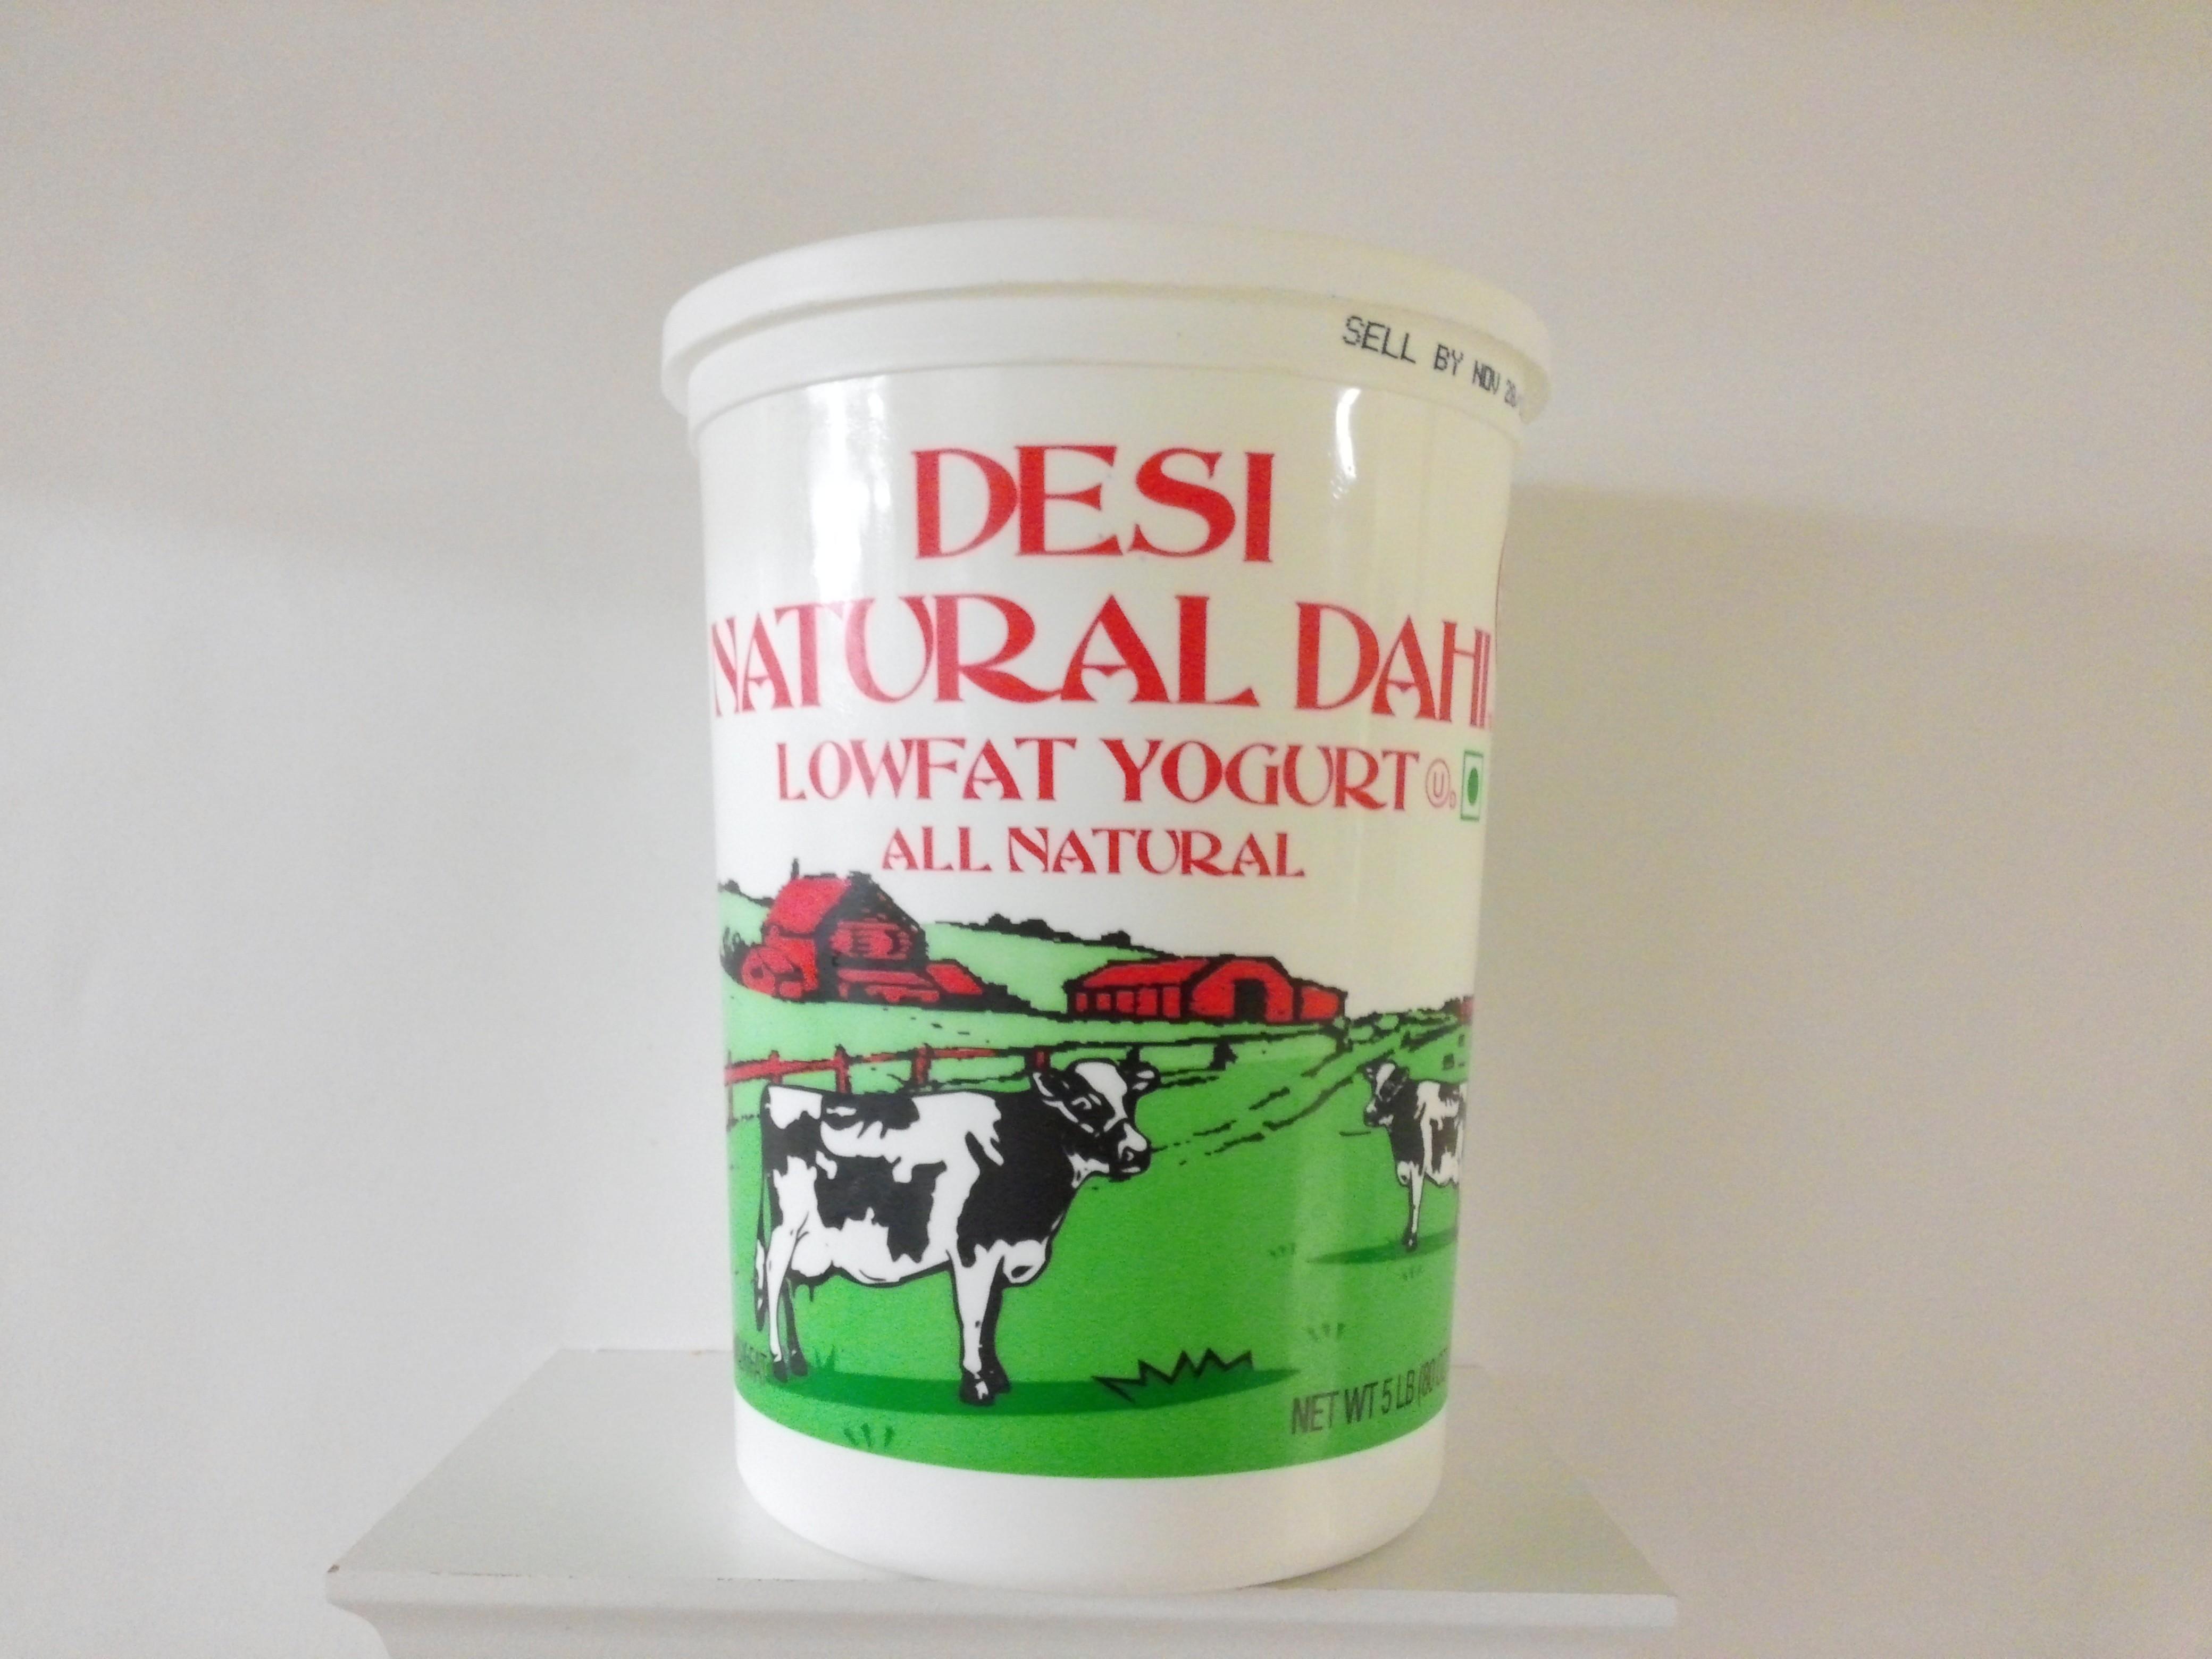 Desi Low Fat Yogurt 5 lbs